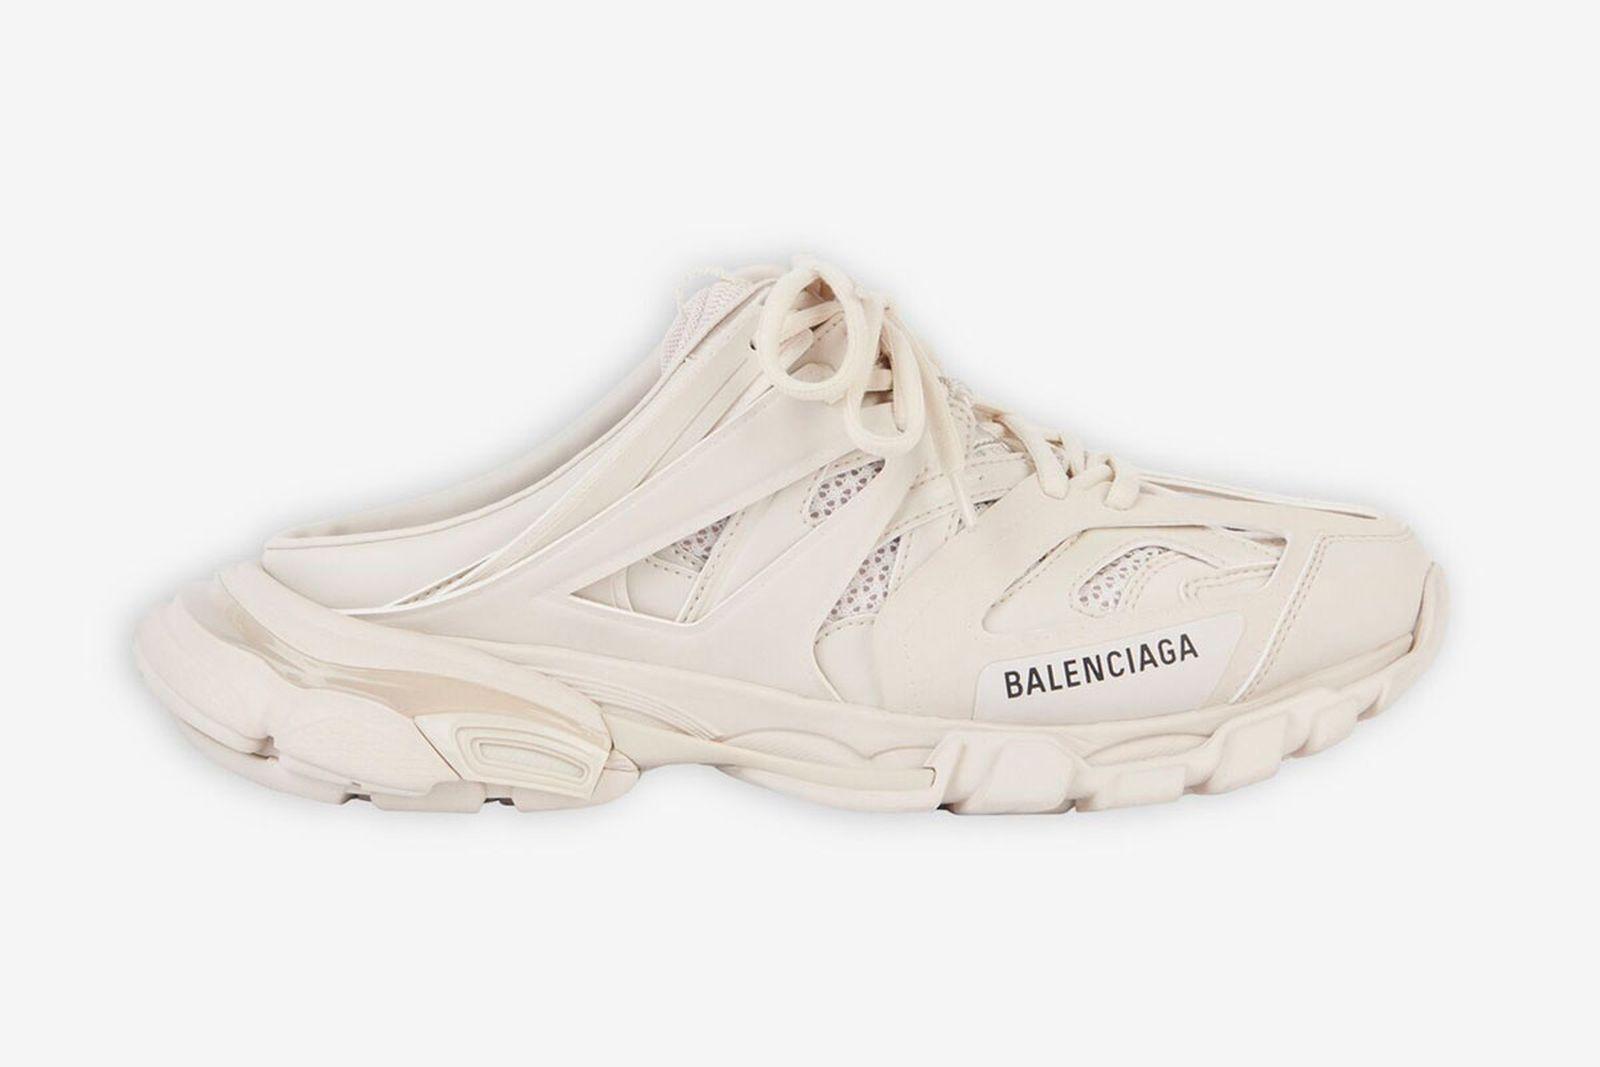 balenciaga-track-mule-release-date-price-04